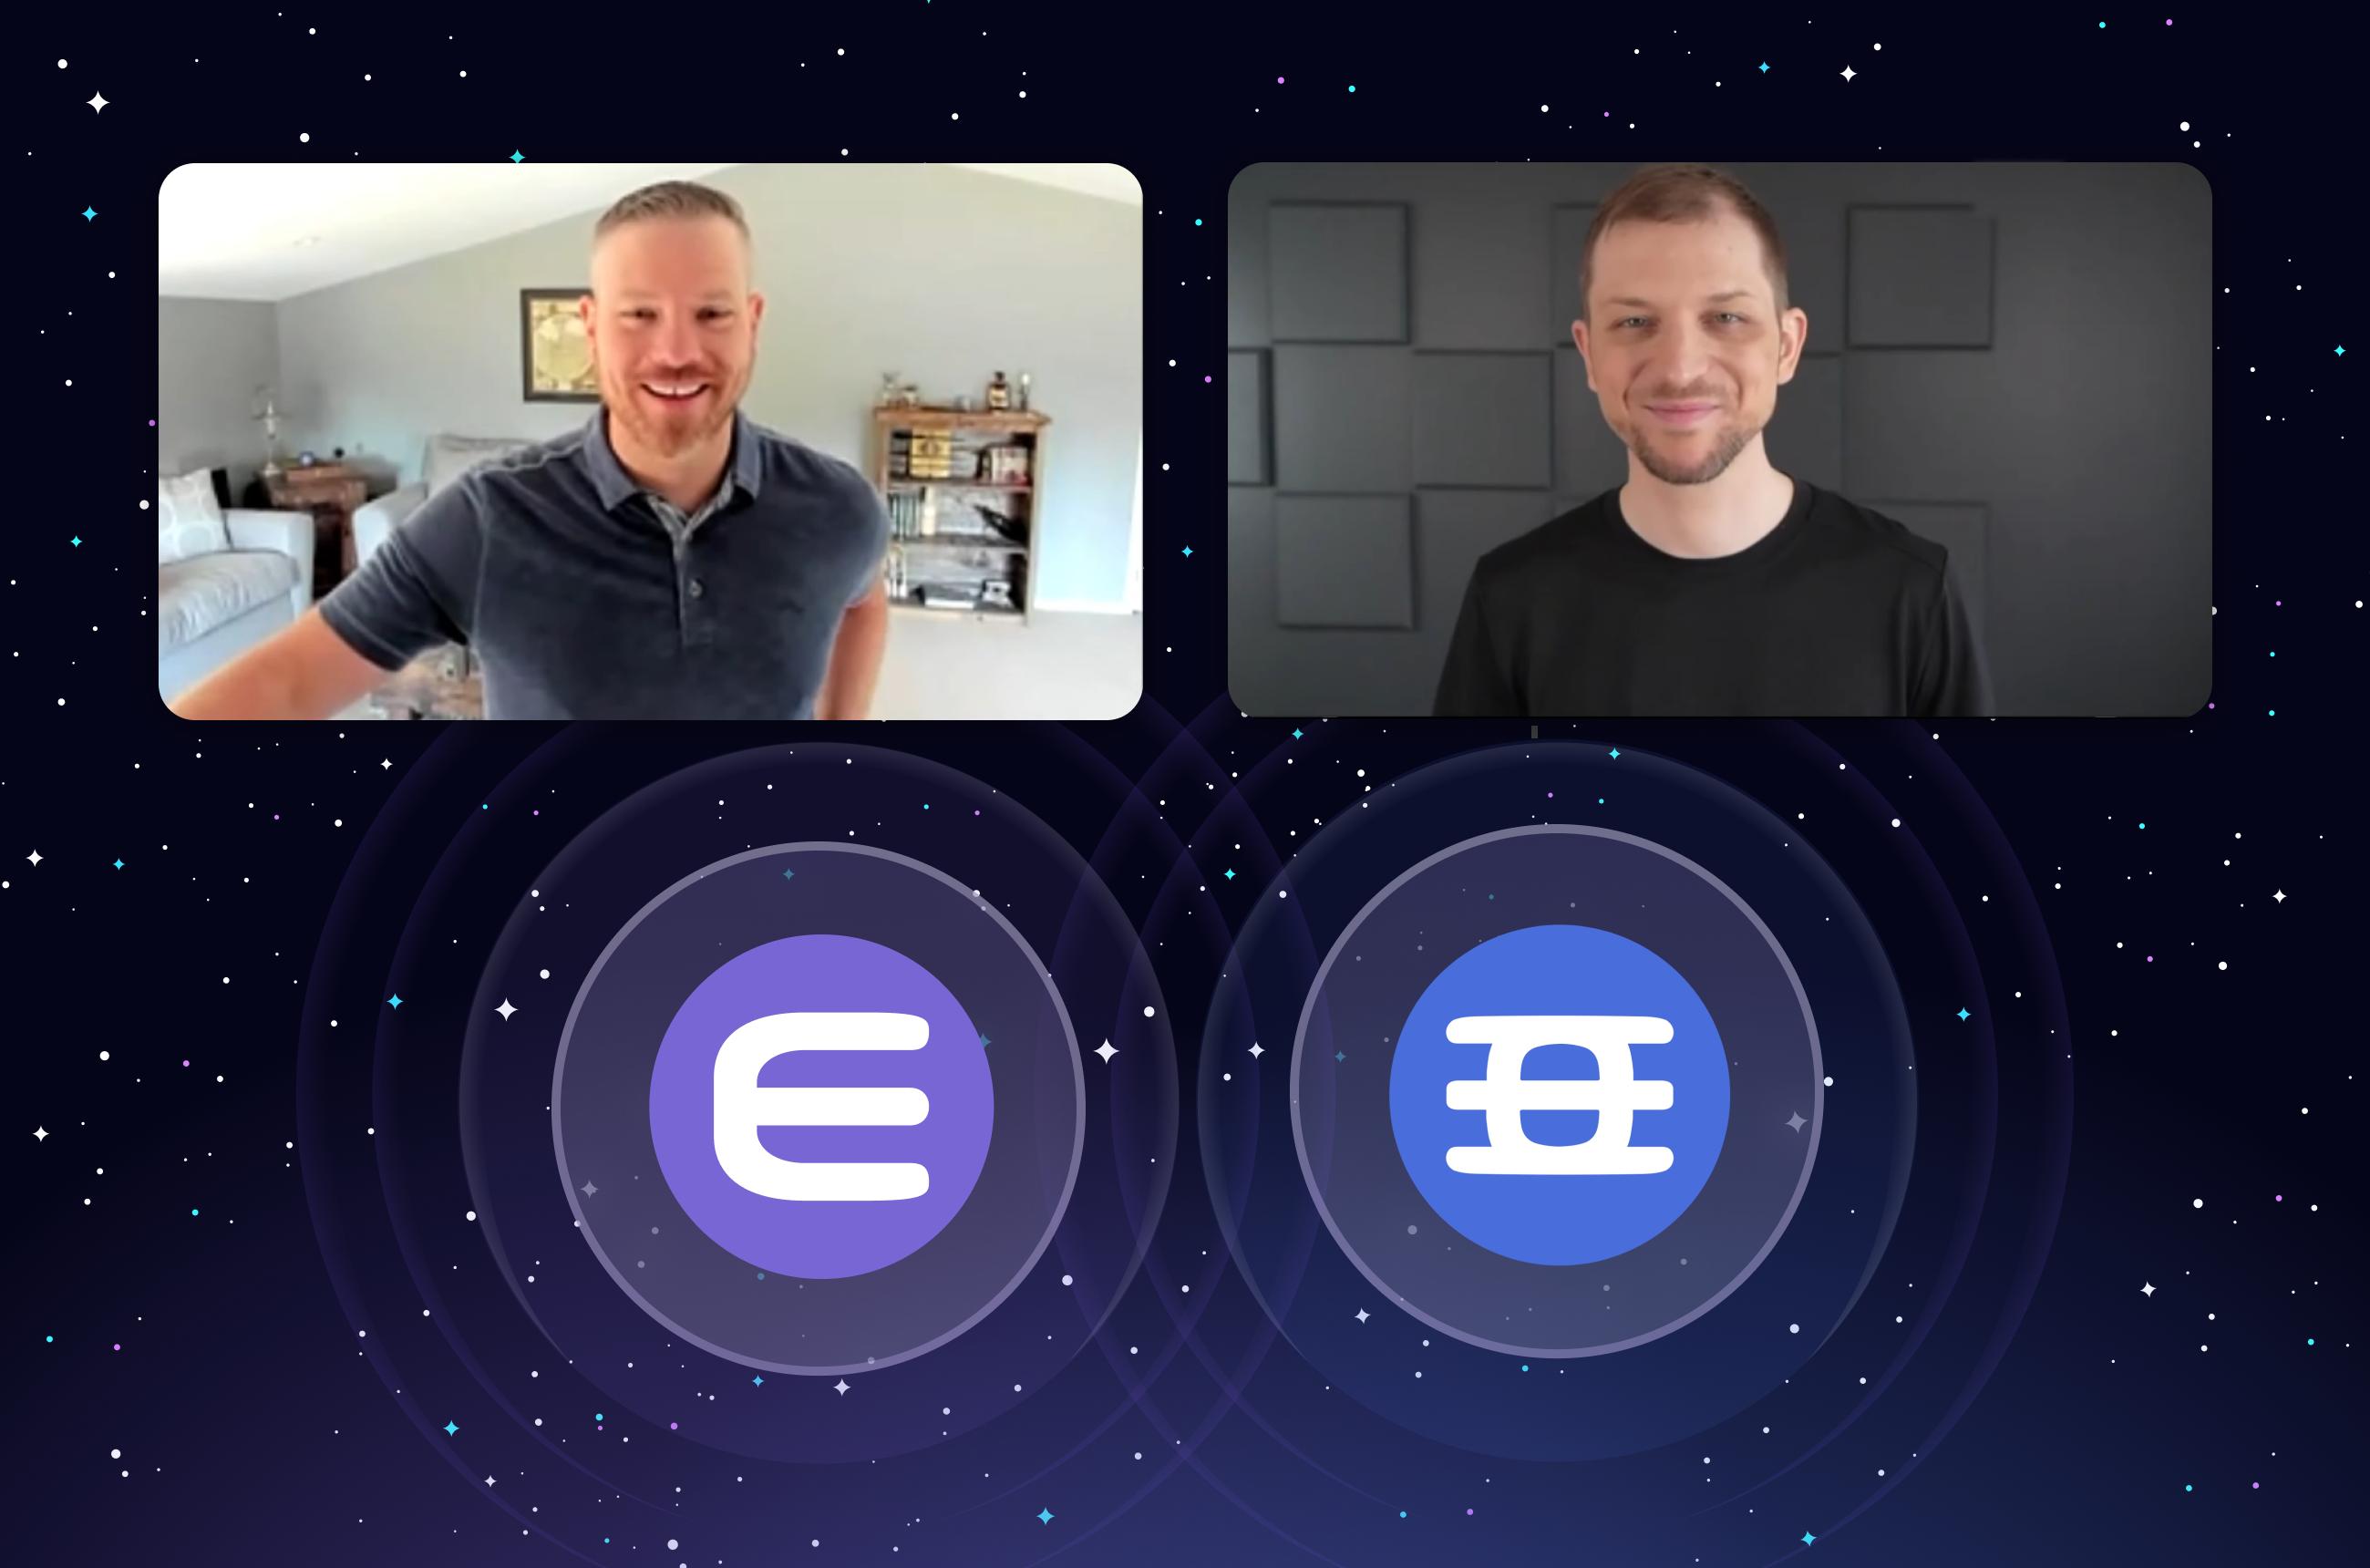 Enjin Ecosystem Vlog, Episode Four: Q4 2021 Product Roadmap